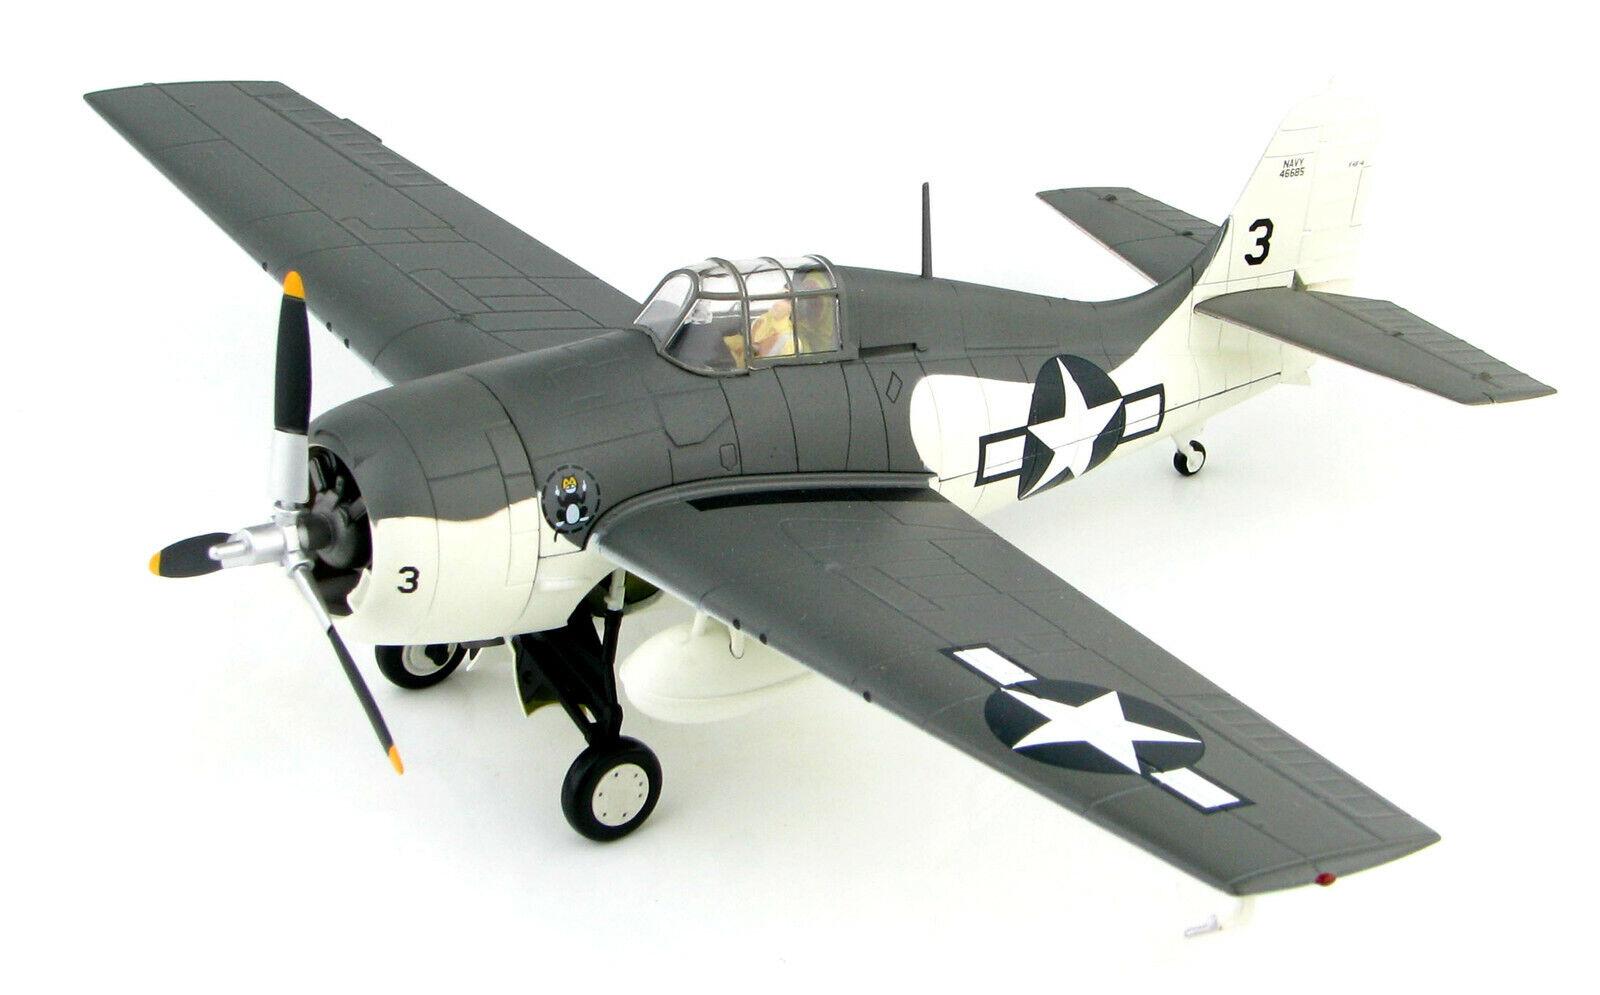 Hobby Master 1 48 Us Navy Grumman F4F-4 Wildcat Fighter-VC-12, 1944,  HA8903